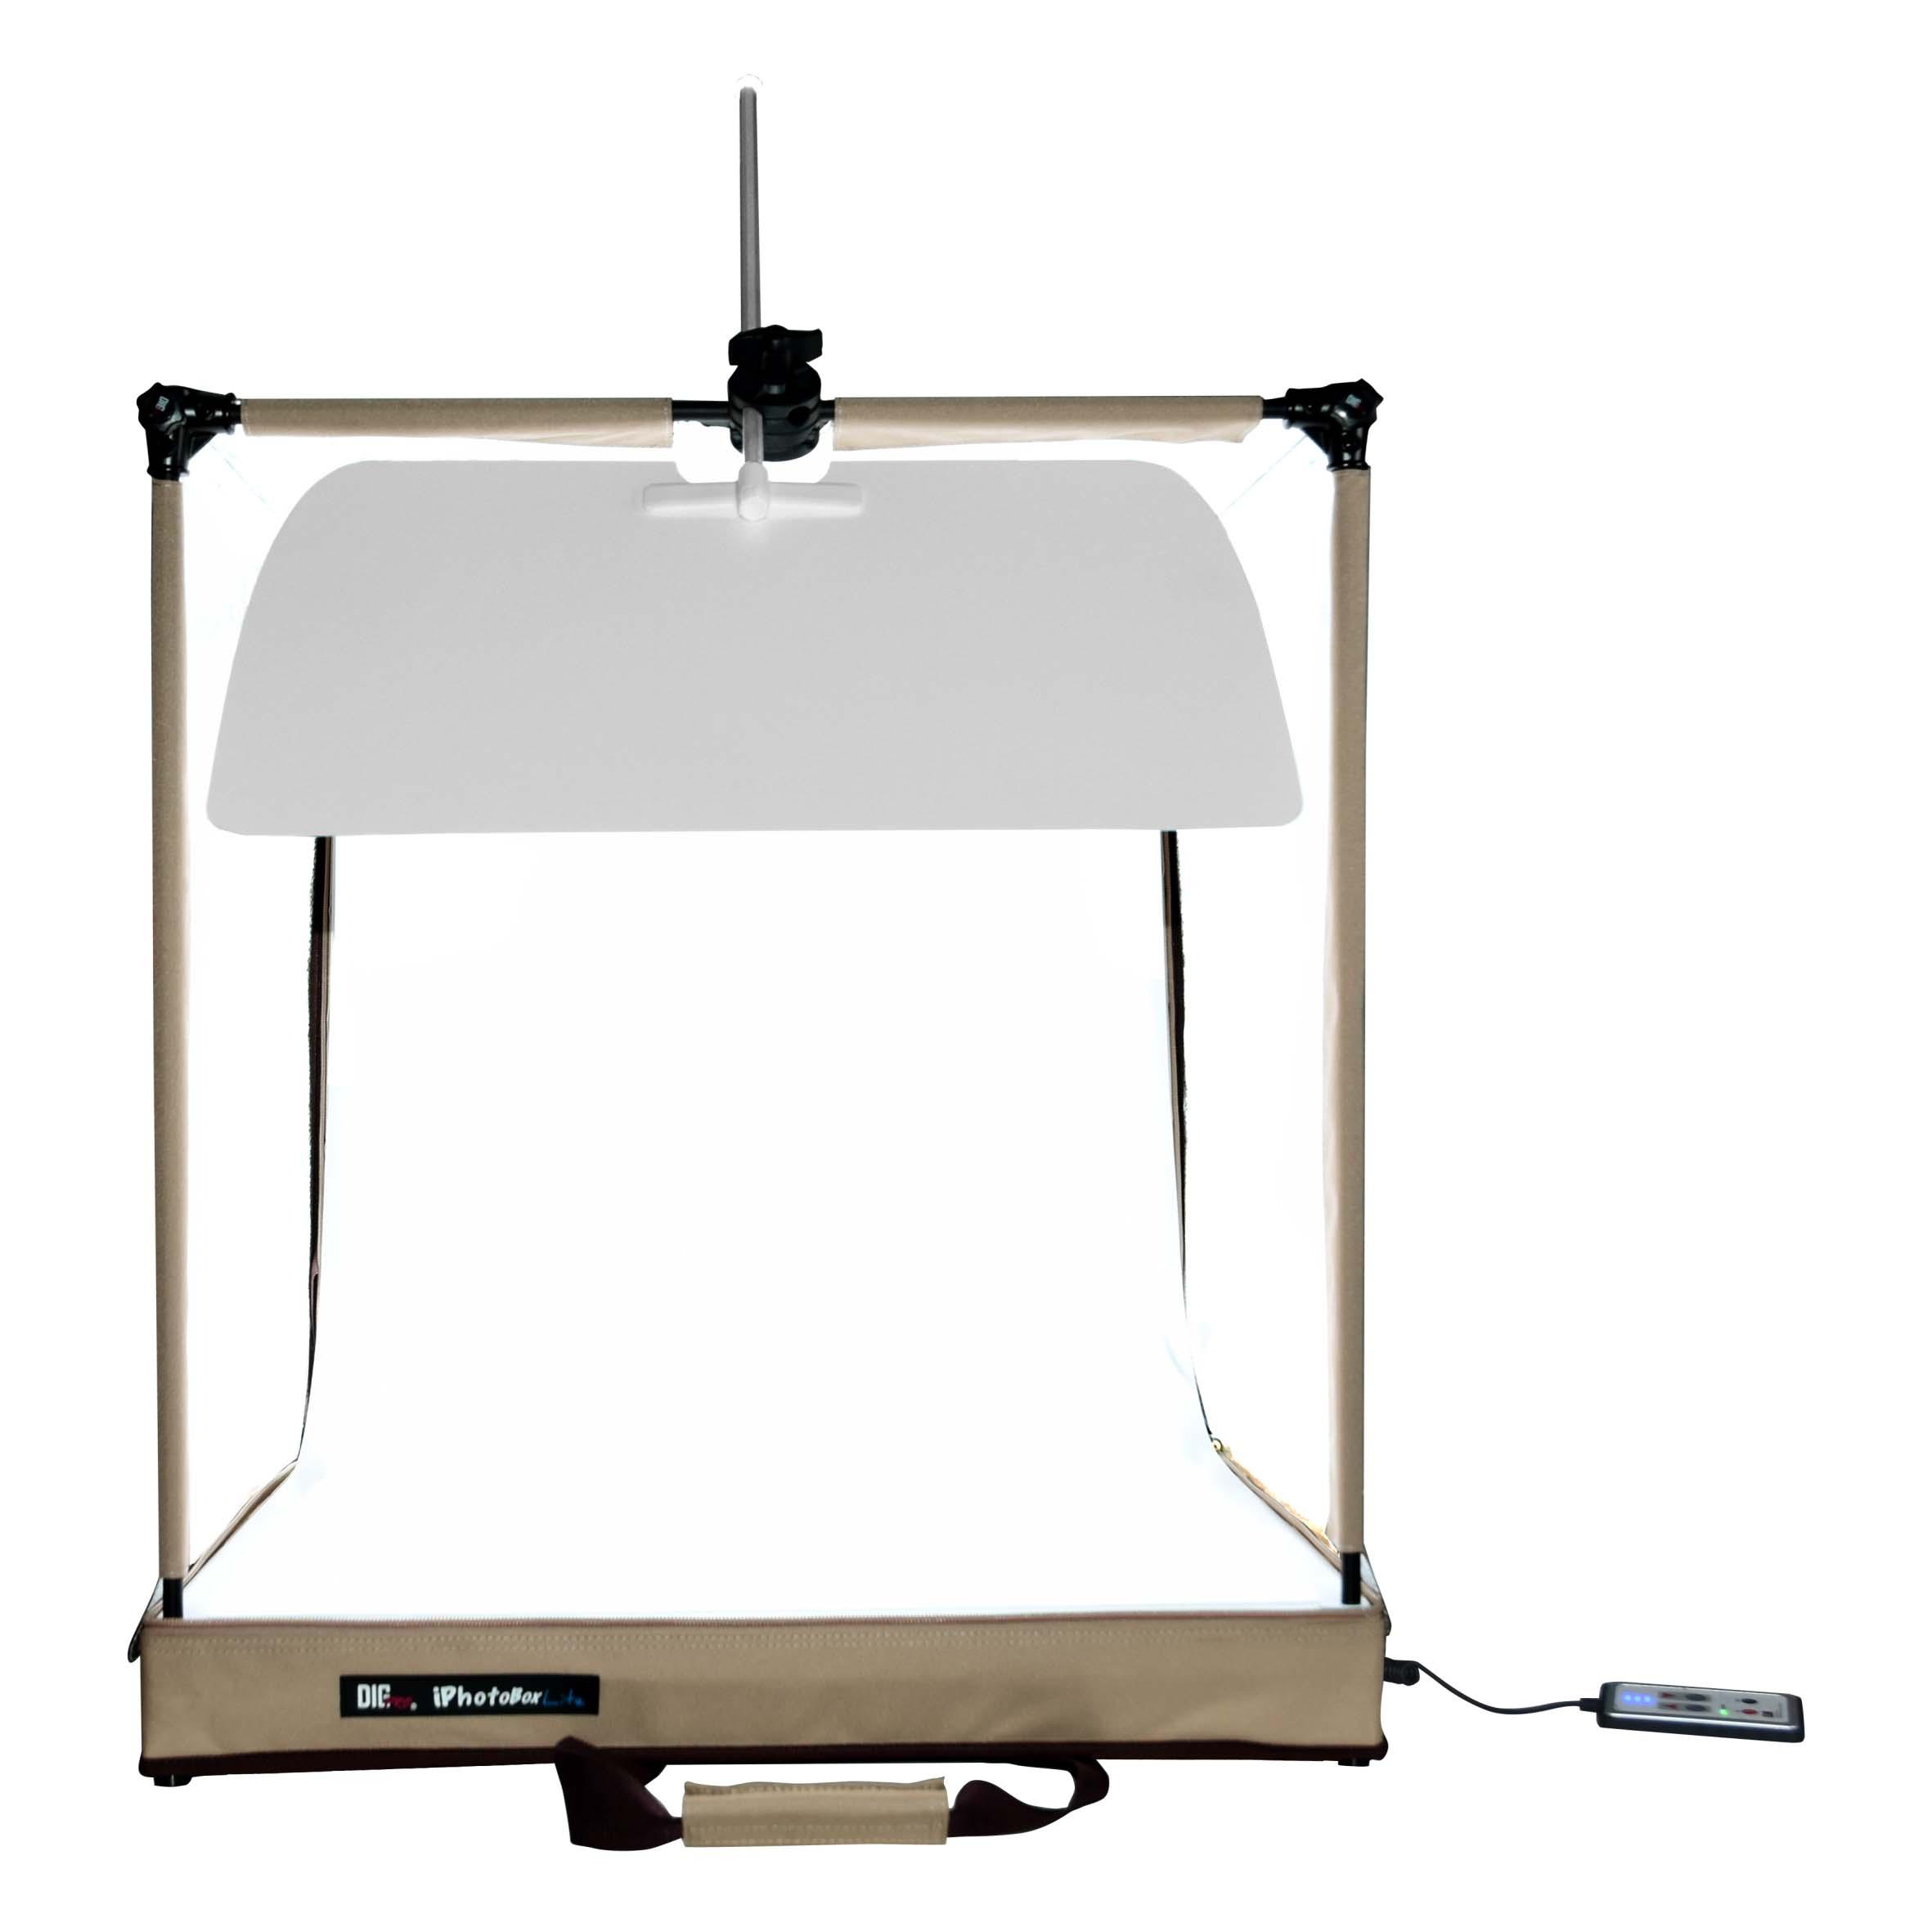 iPhotoBox Lite Mini Studio 60CM Light Tent | Photo Studio | 360 Product Photography - Digpro Online Shop Hong Kong  sc 1 st  Digpro Online Shop Hong Kong & iPhotoBox Lite Mini Studio 60CM Light Tent | Photo Studio | 360 ...